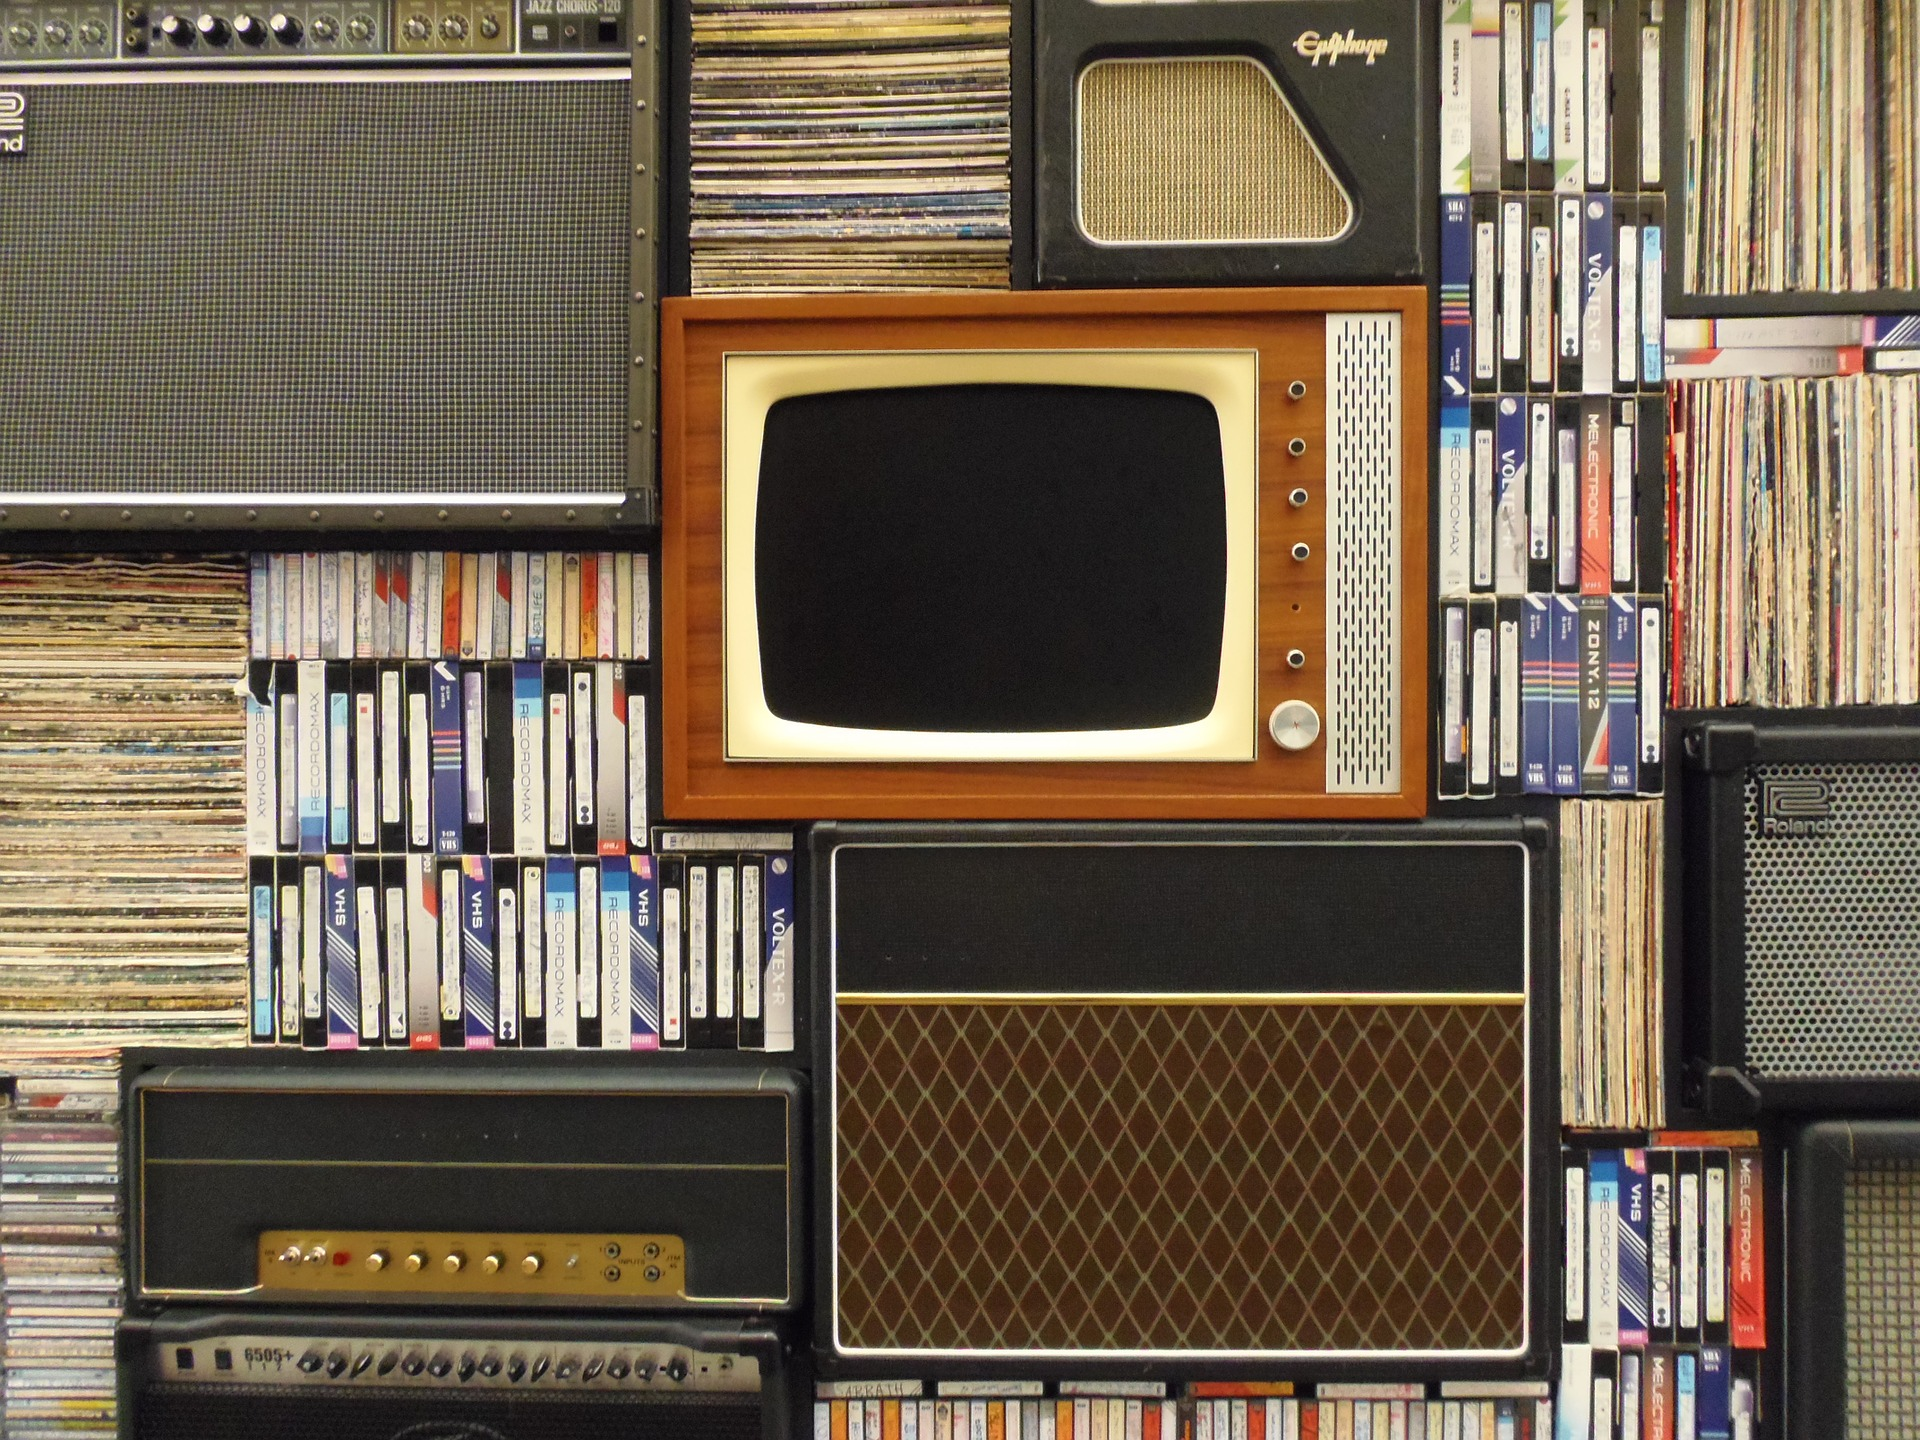 Fernsehen und Social Media